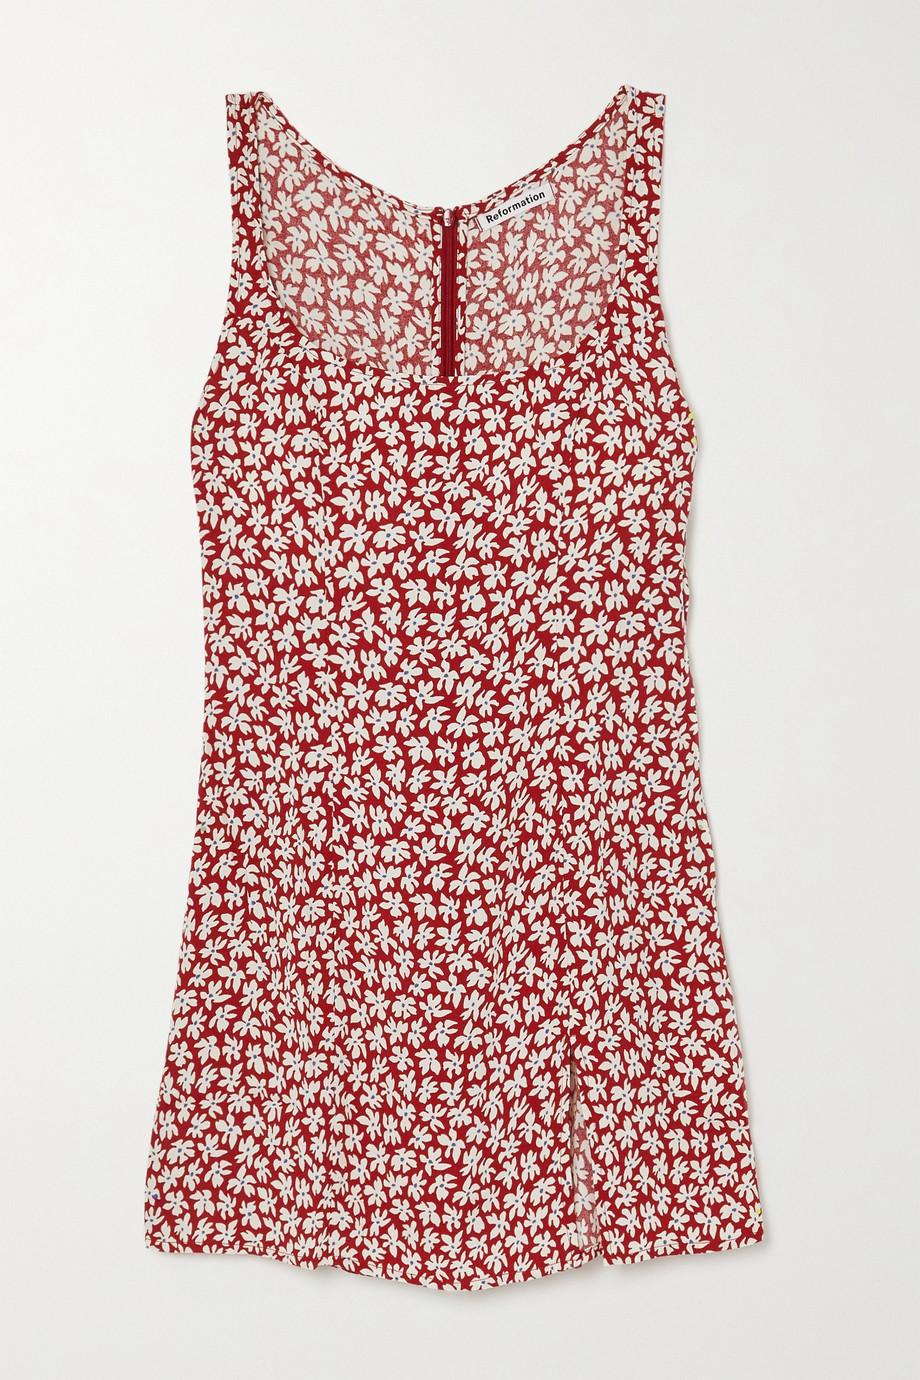 Reformation Noha floral-print crepe mini dress